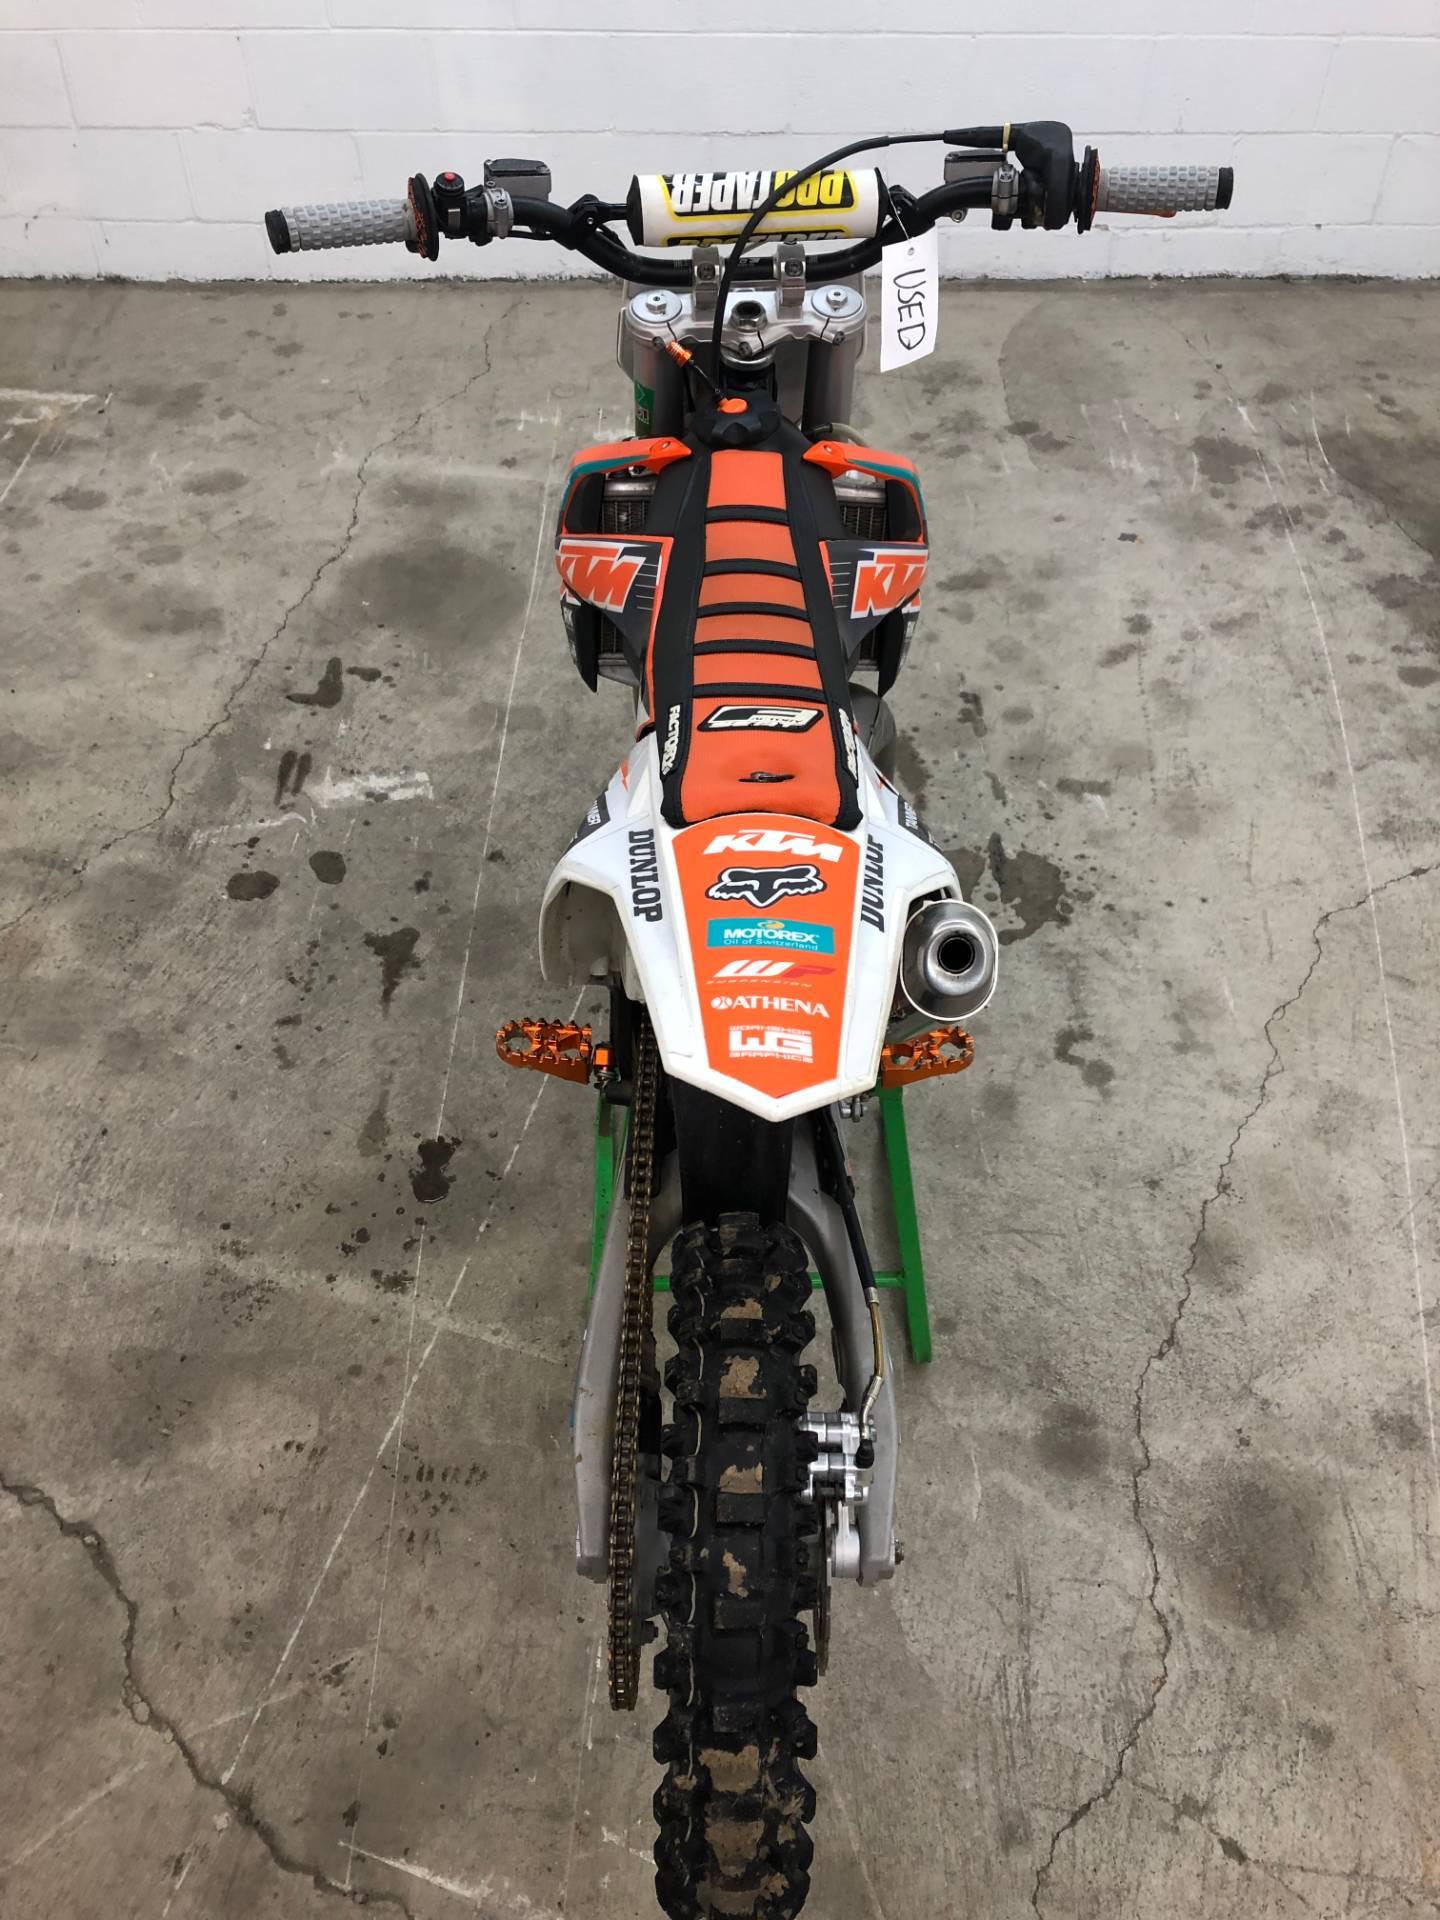 2016 Ktm 65 Sx Motorcycles Pendleton New York